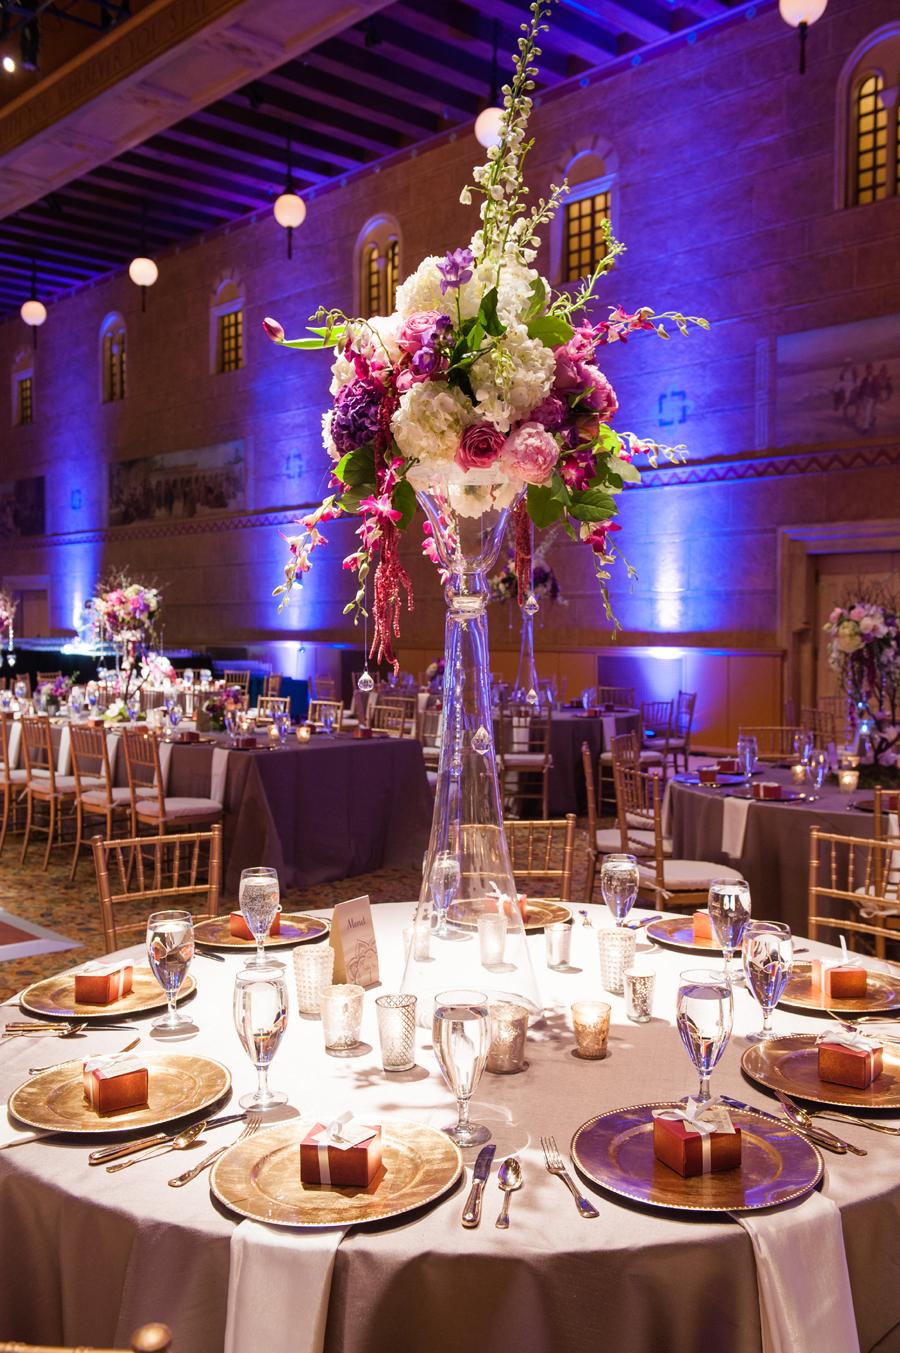 Bridalbliss.com | Portland Wedding | Oregon Event Planning and Design | Powers Studio Photography | Geranium Lake Florals